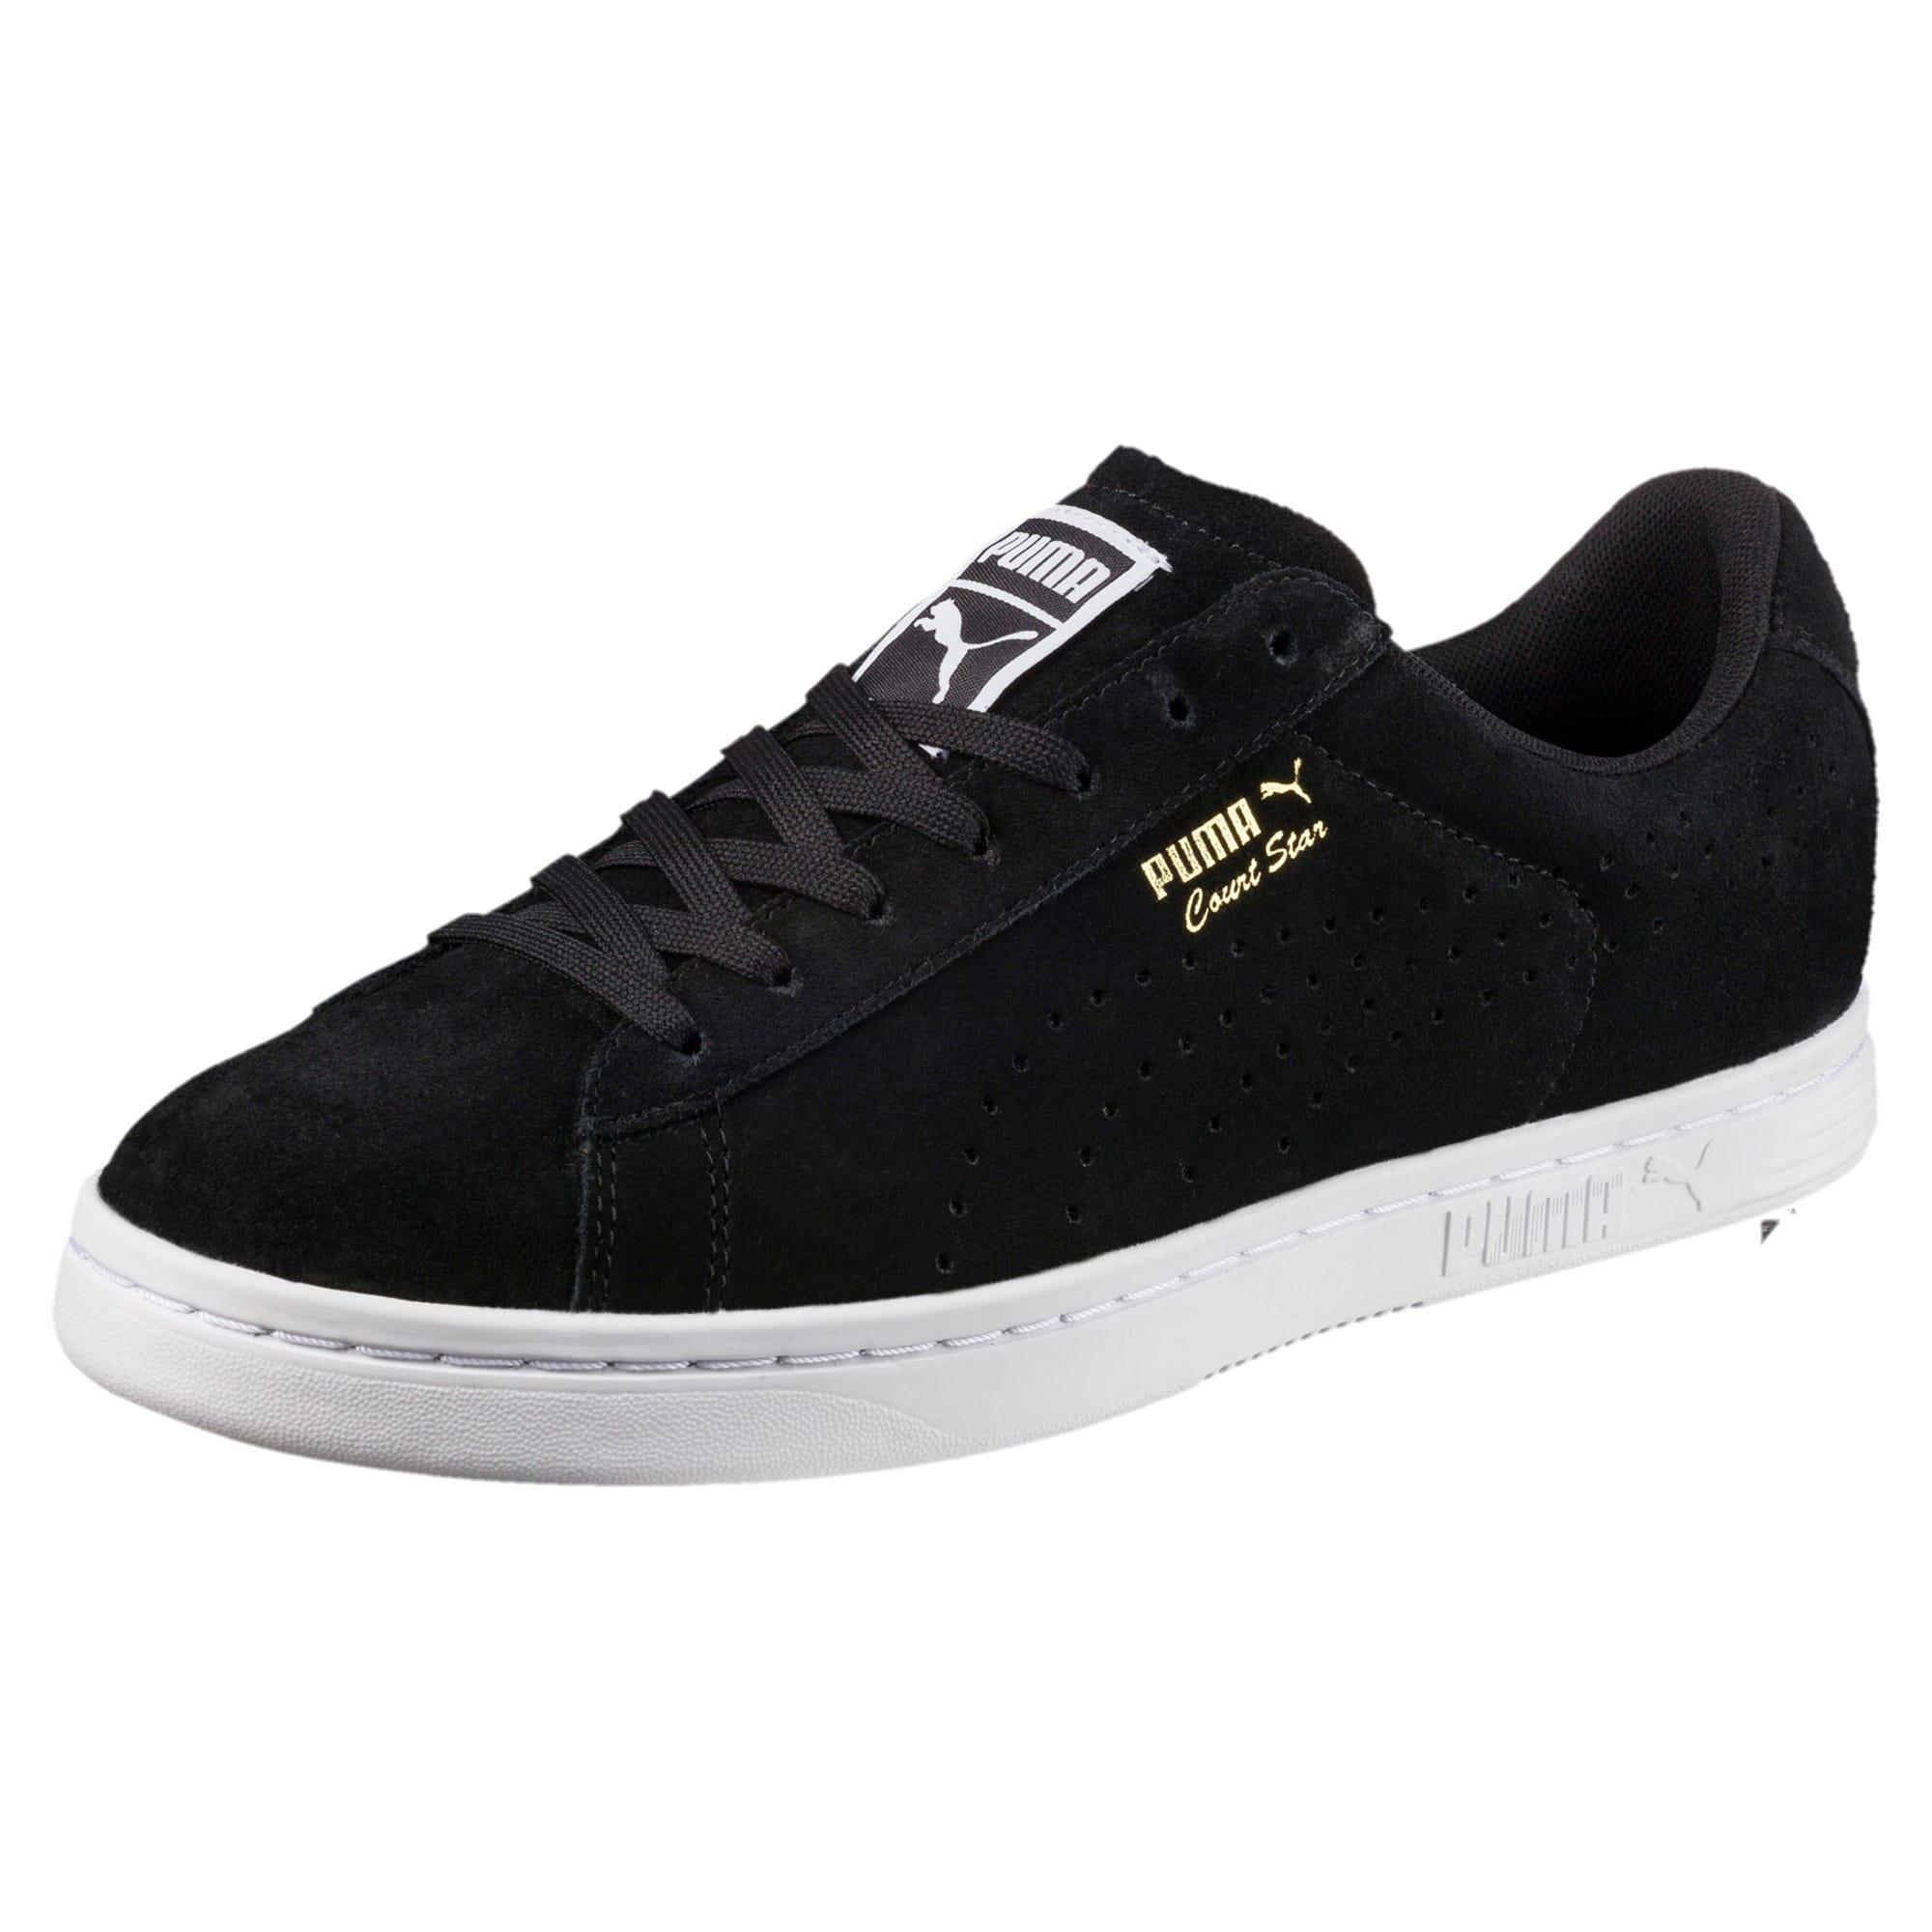 Thumbnail 1 of Court Star Suede Sneakers, Puma Black, medium